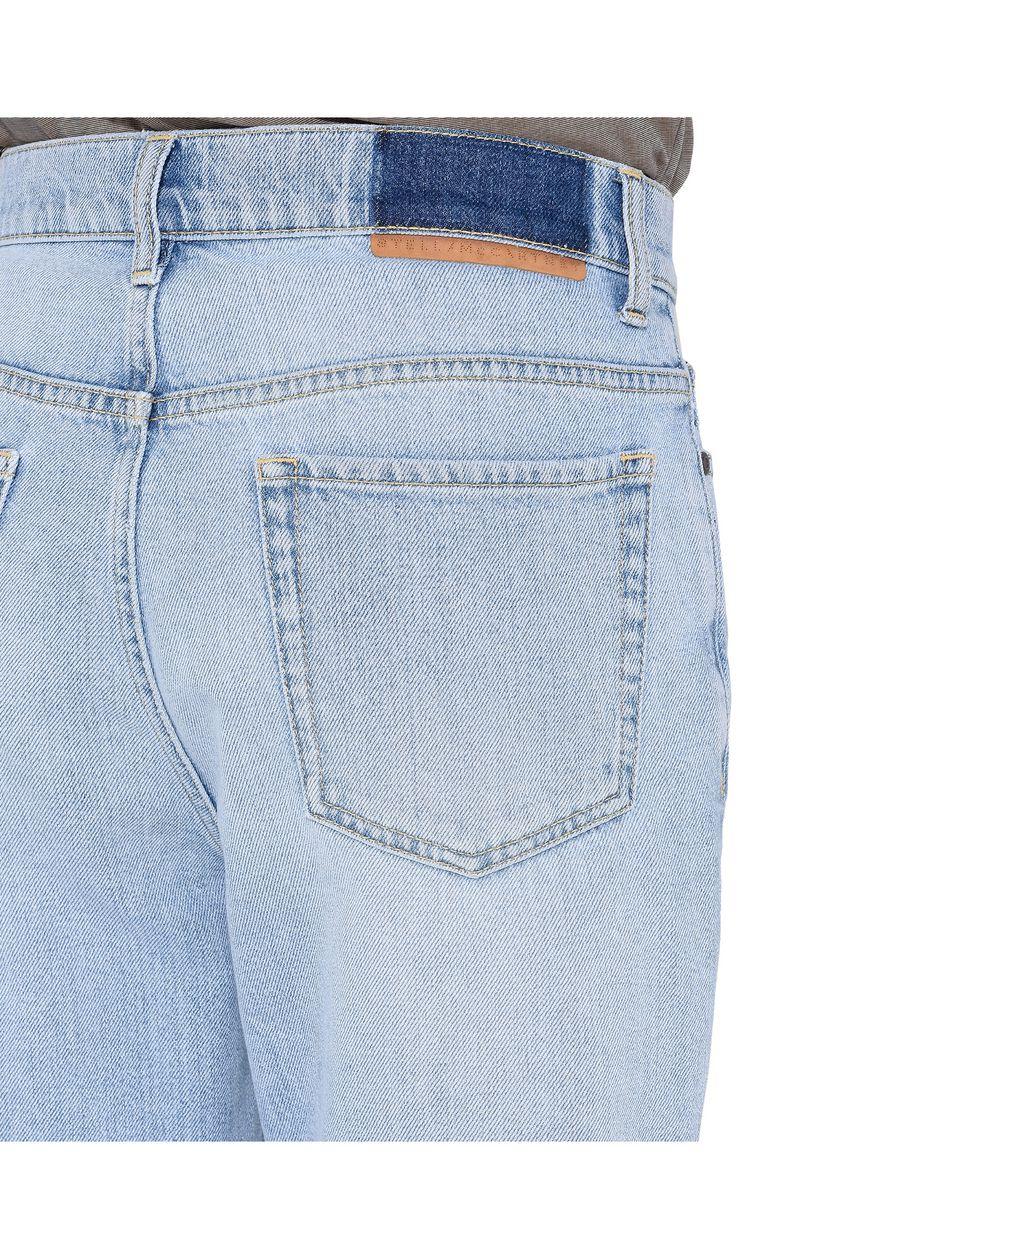 Bleached Denzel Carrot Jeans - STELLA McCARTNEY MEN